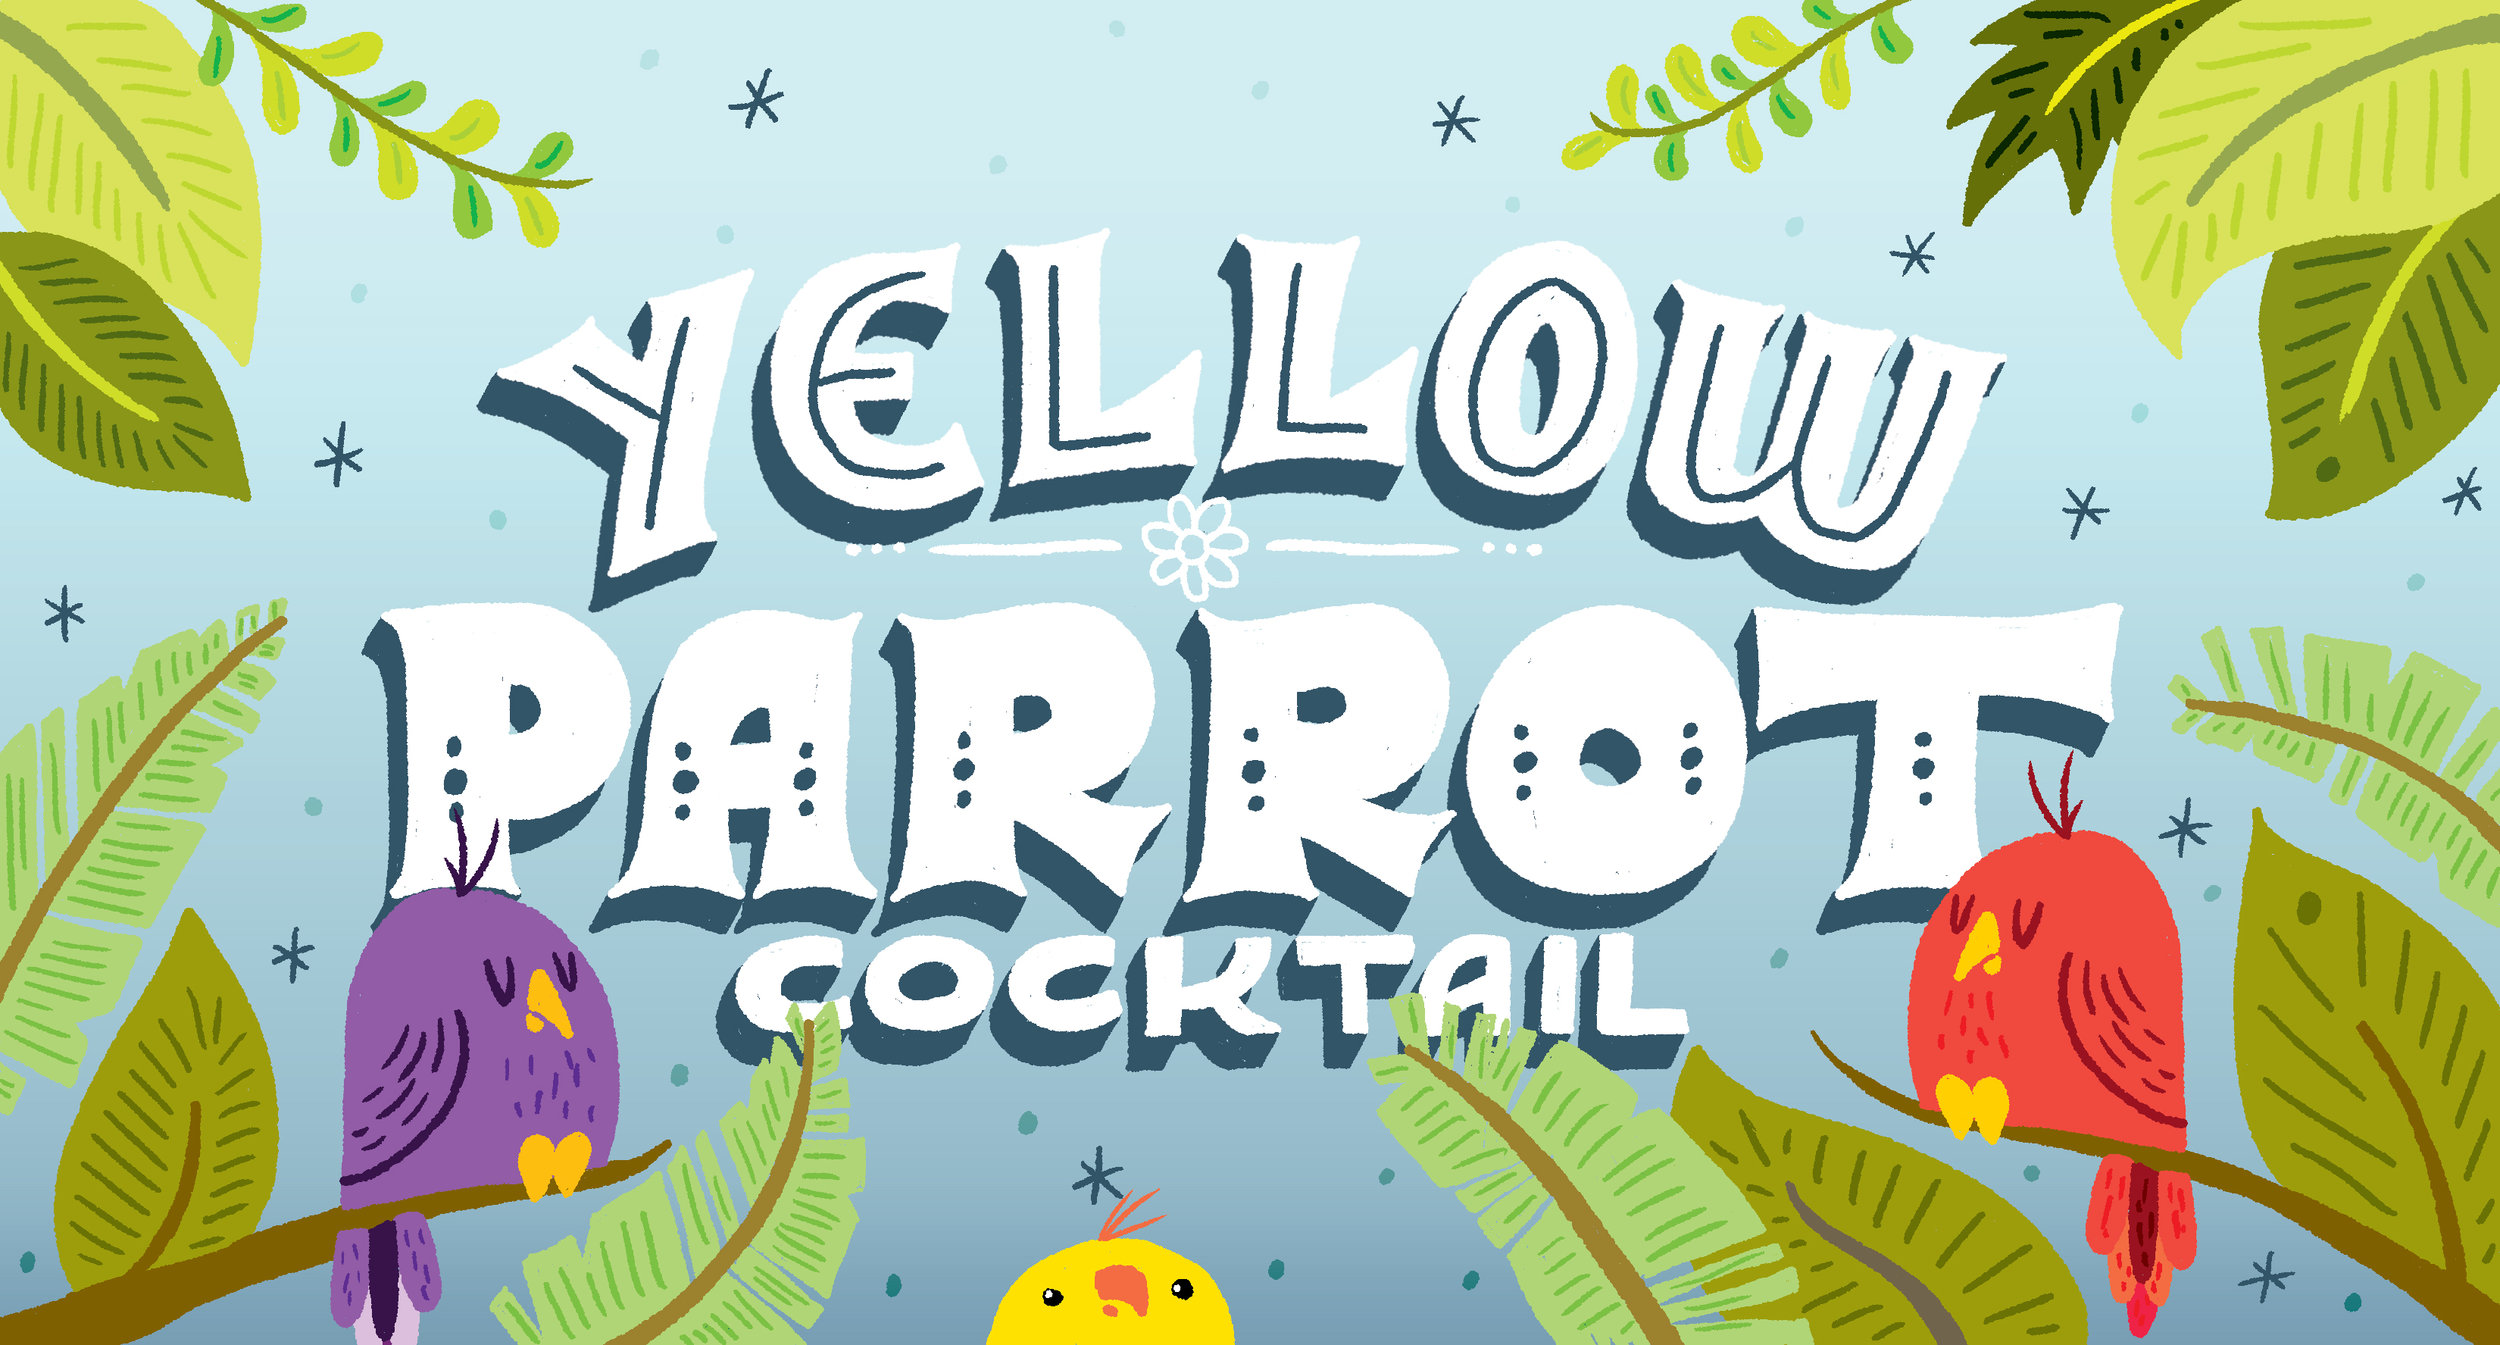 007-yellowparrotcocktail.jpg